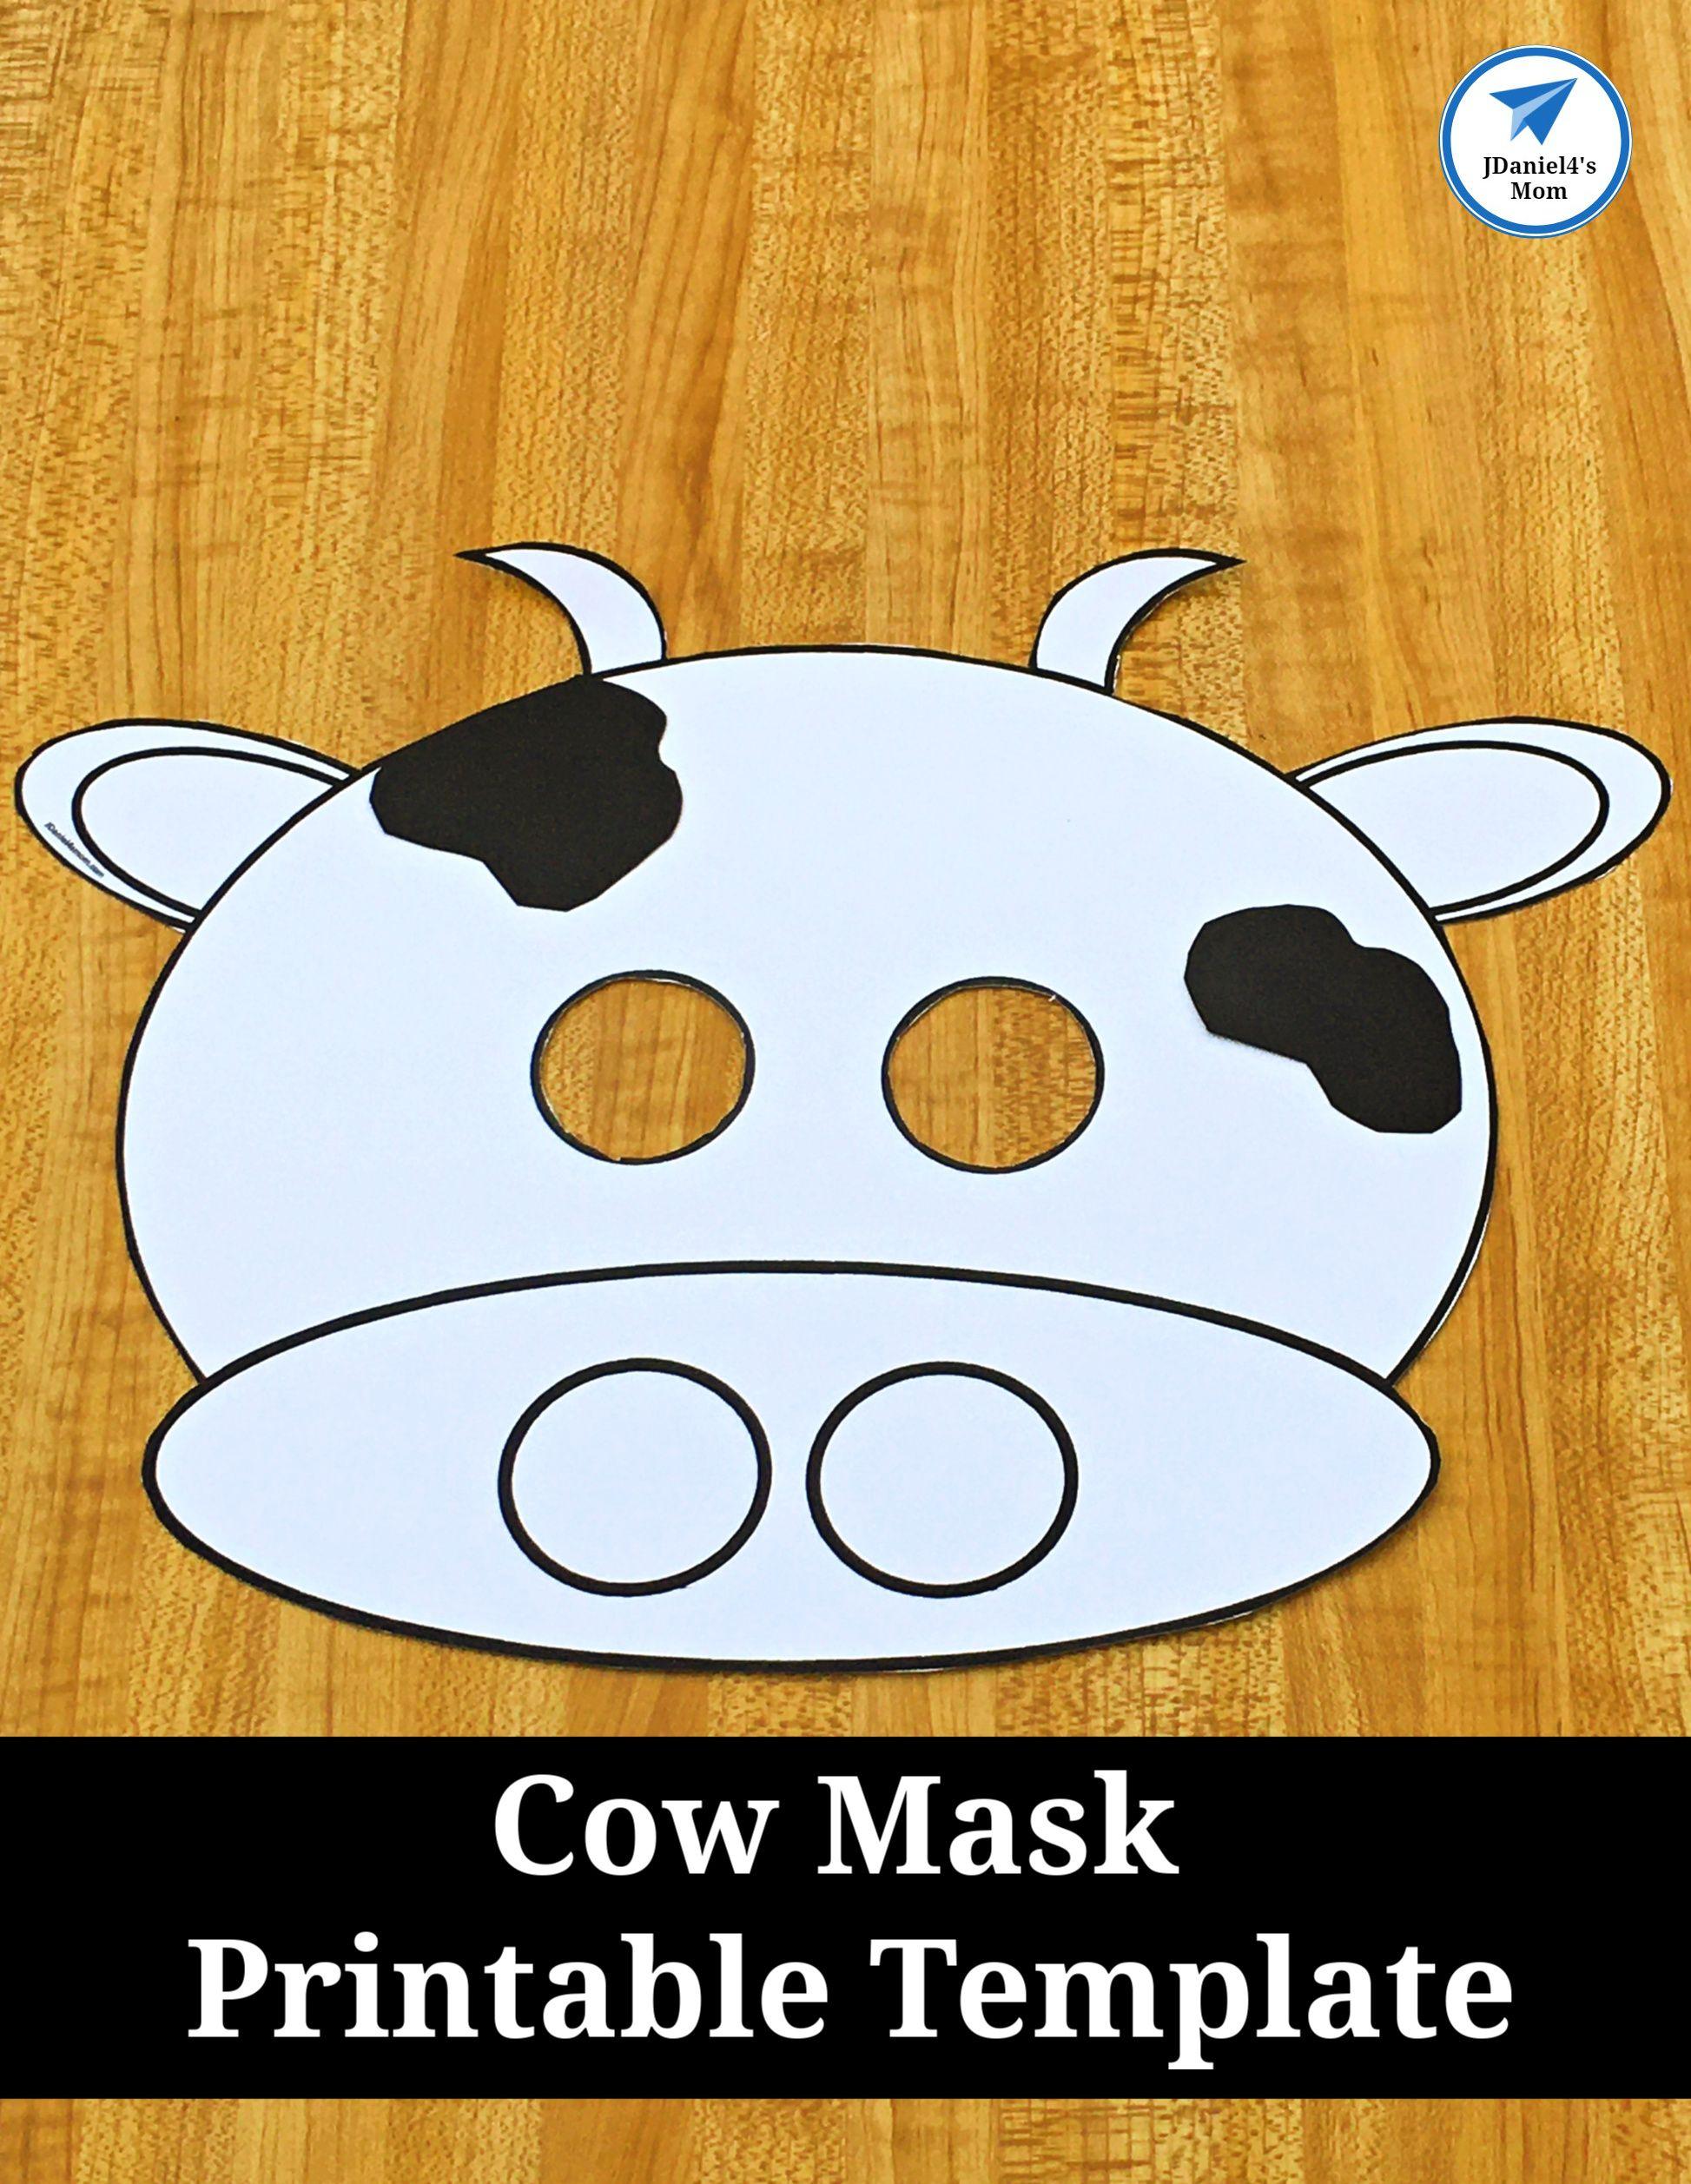 Cow Mask Printable Template Jdaniel4s Mom Cowmask Cowtemplate Farm Jdanielsmom Cowcraft Cow Mask Preschool Crafts Cow Craft [ 2515 x 1947 Pixel ]